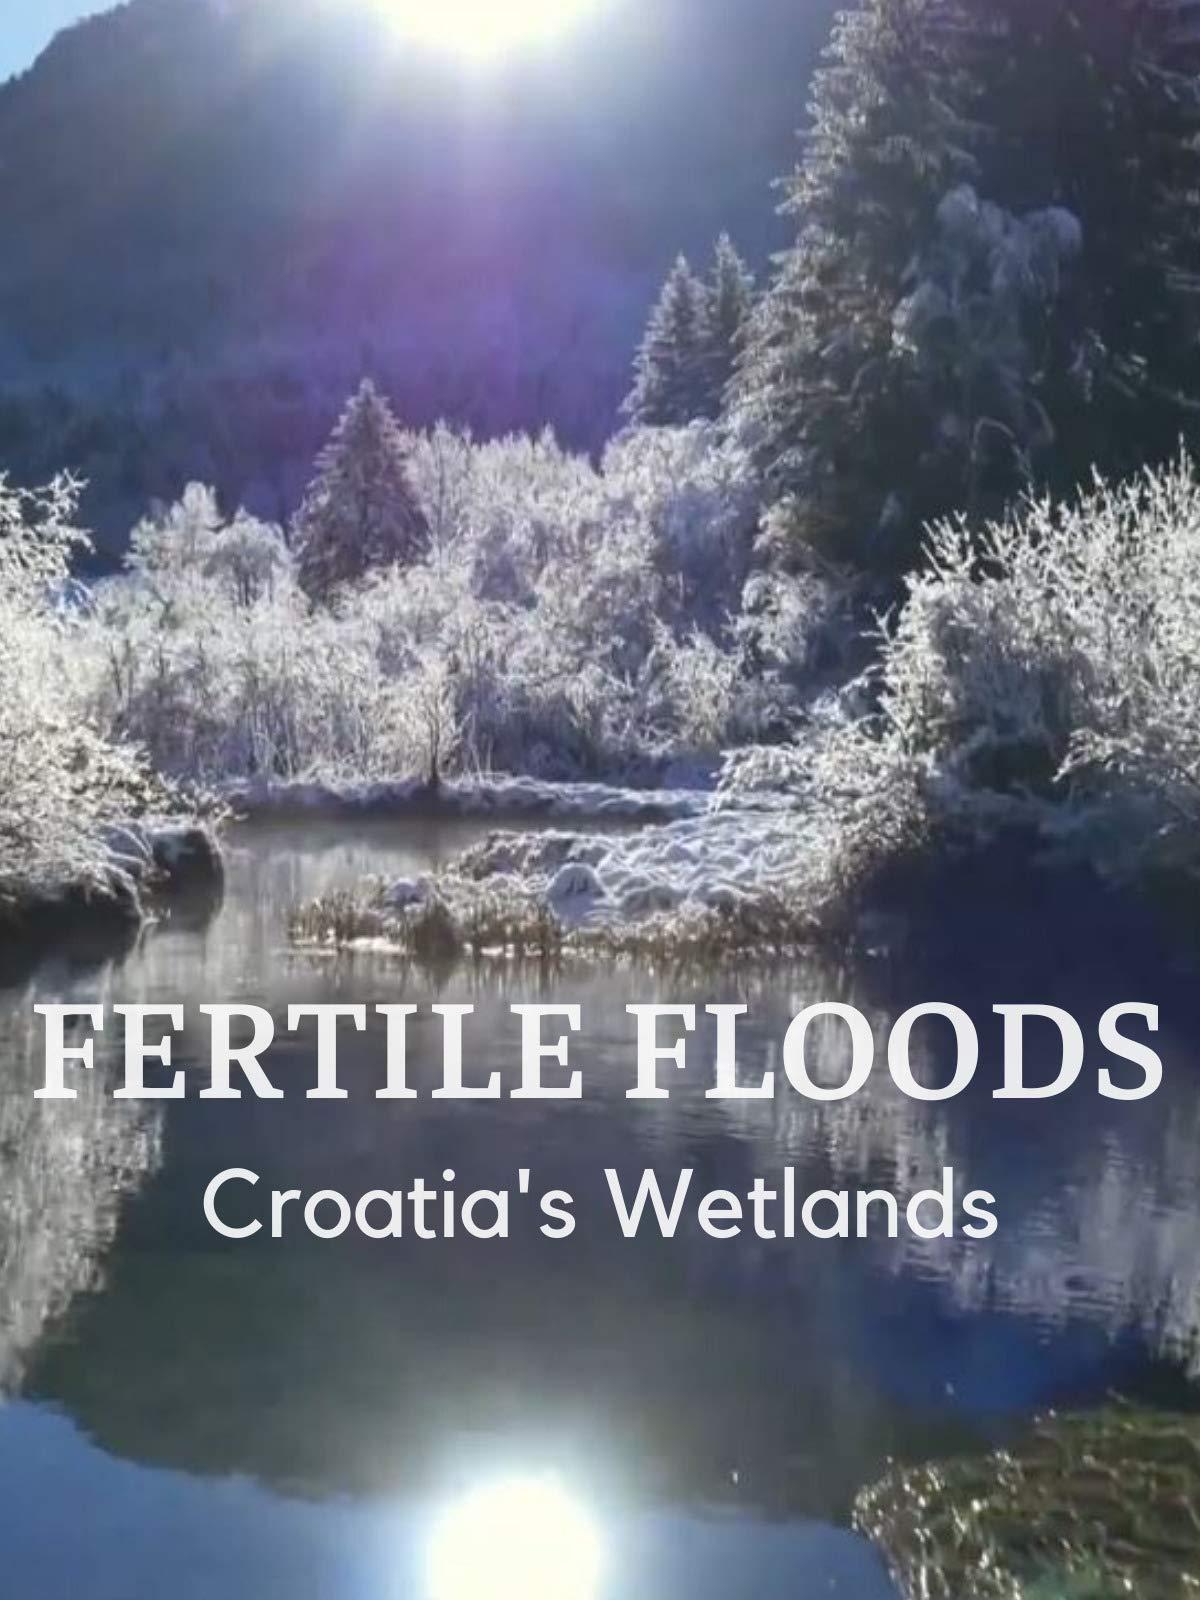 Fertile Floods - Croatia's Wetlands on Amazon Prime Video UK